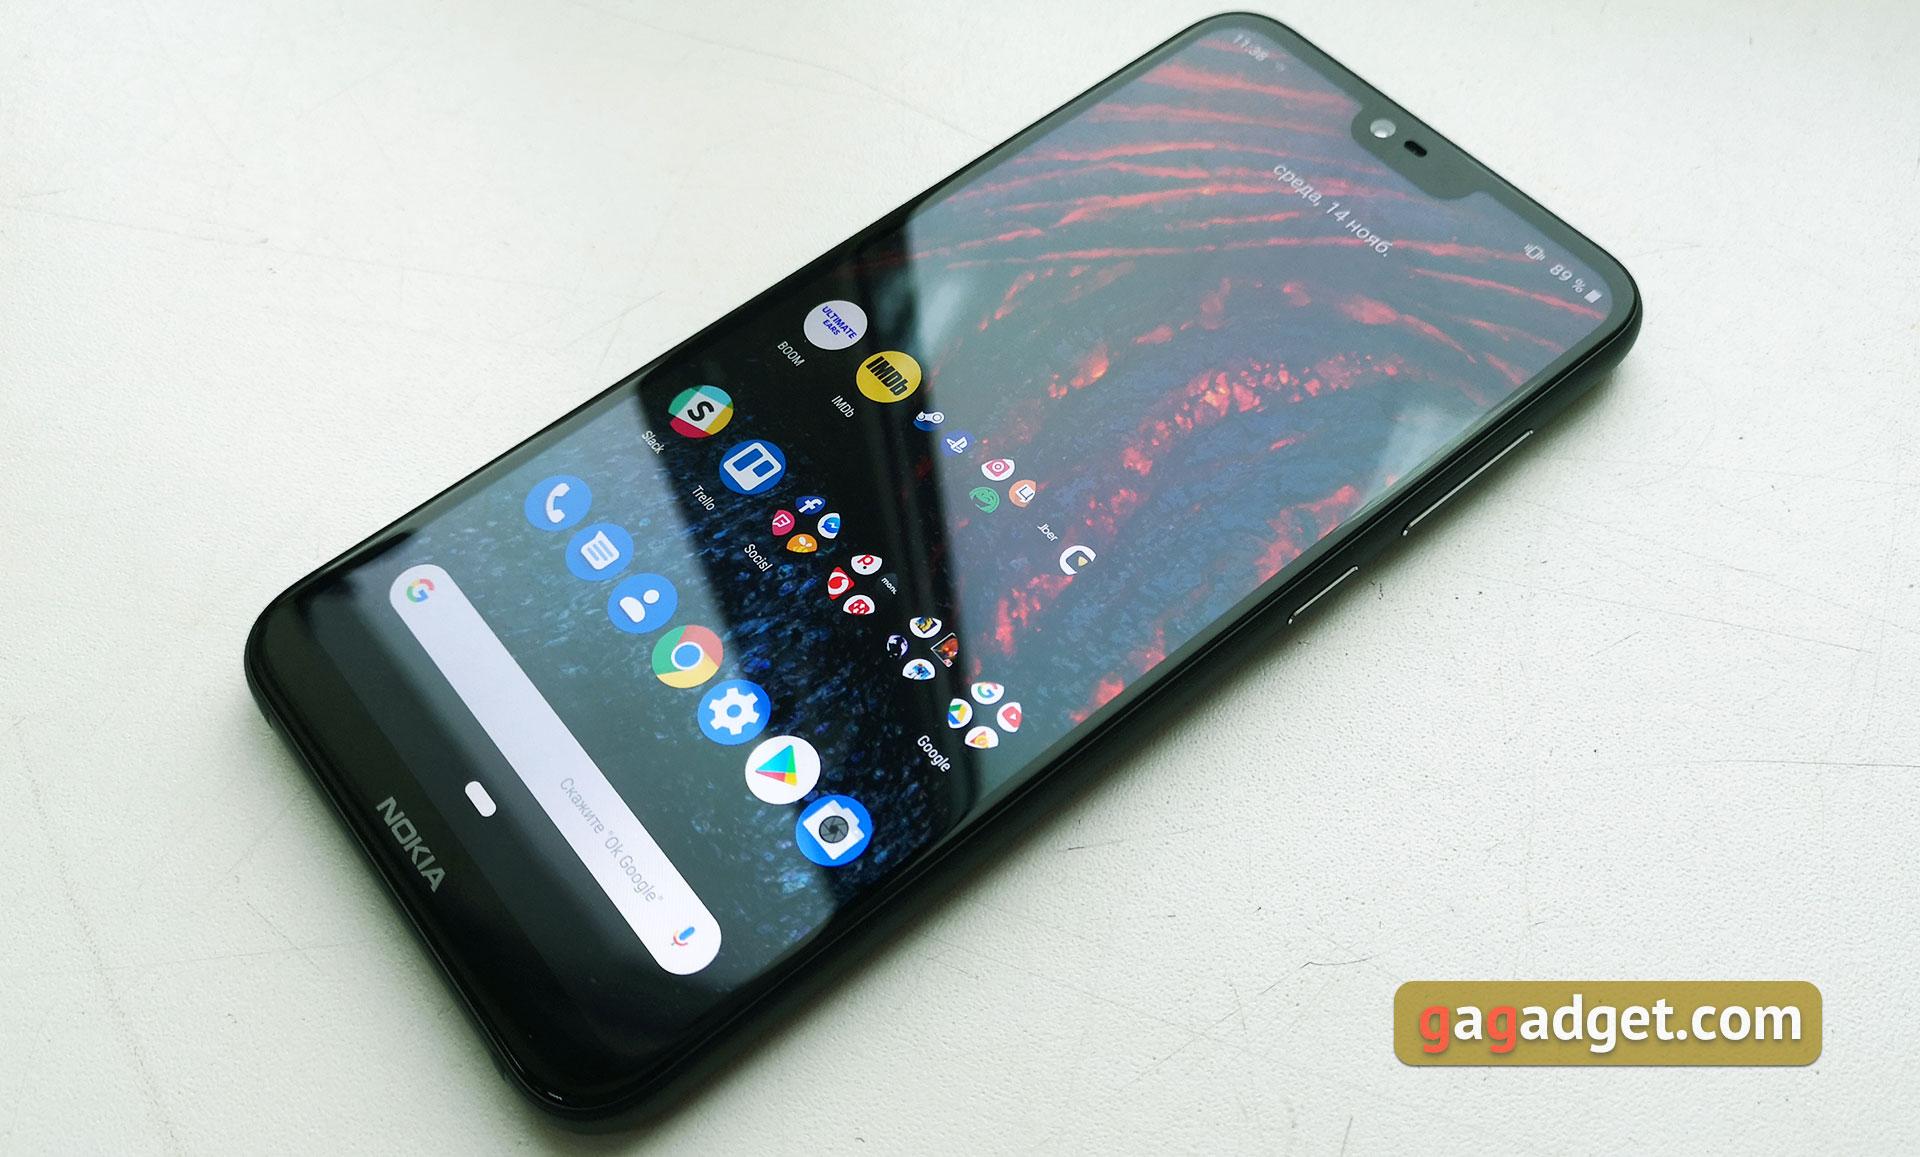 Nokia 61 Plus Android 58 Ips 199 22801080